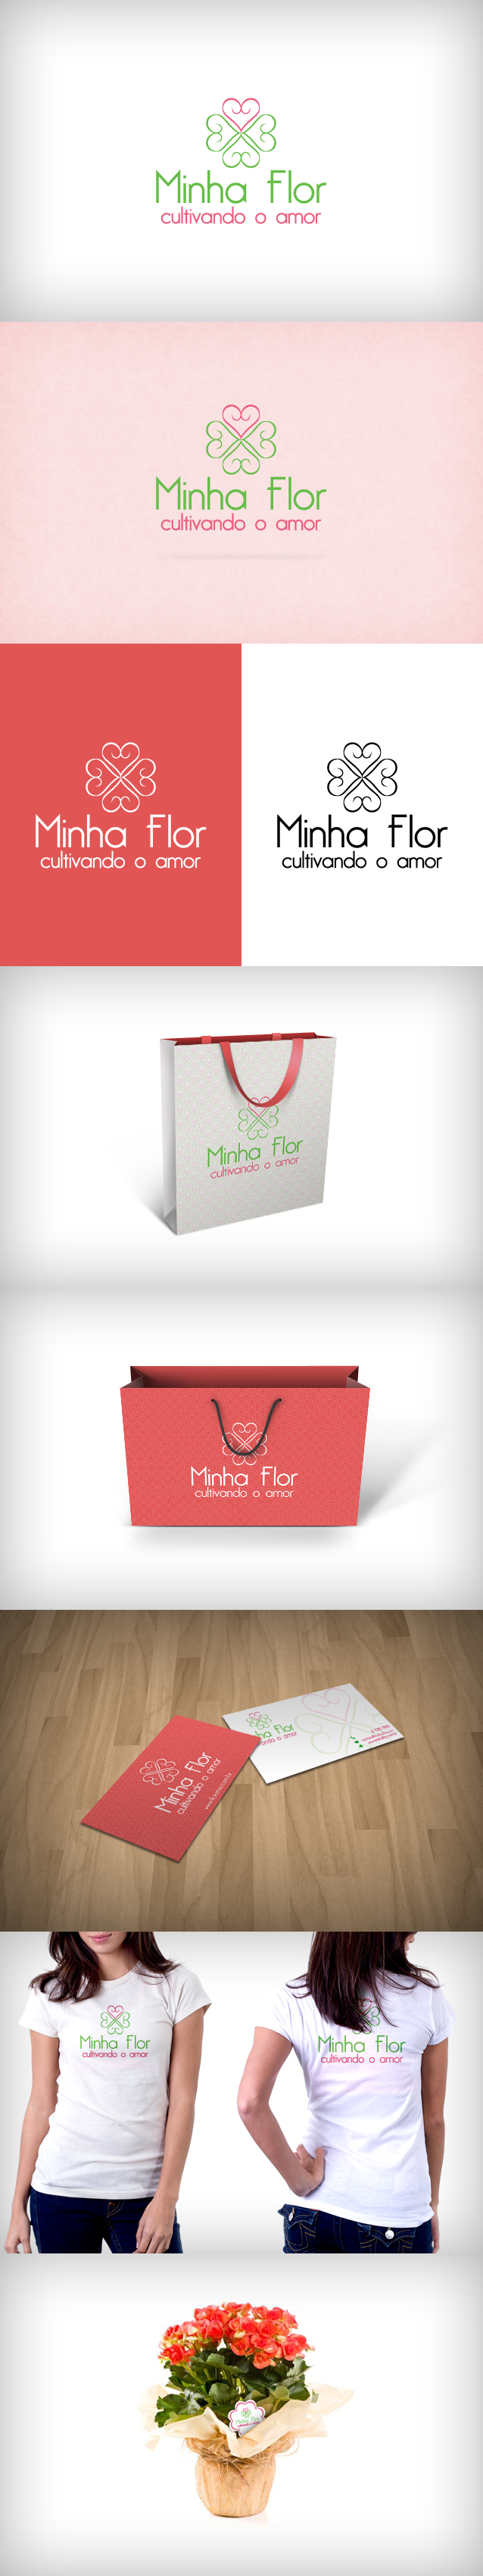 Branding Minha Flor by nilosadi